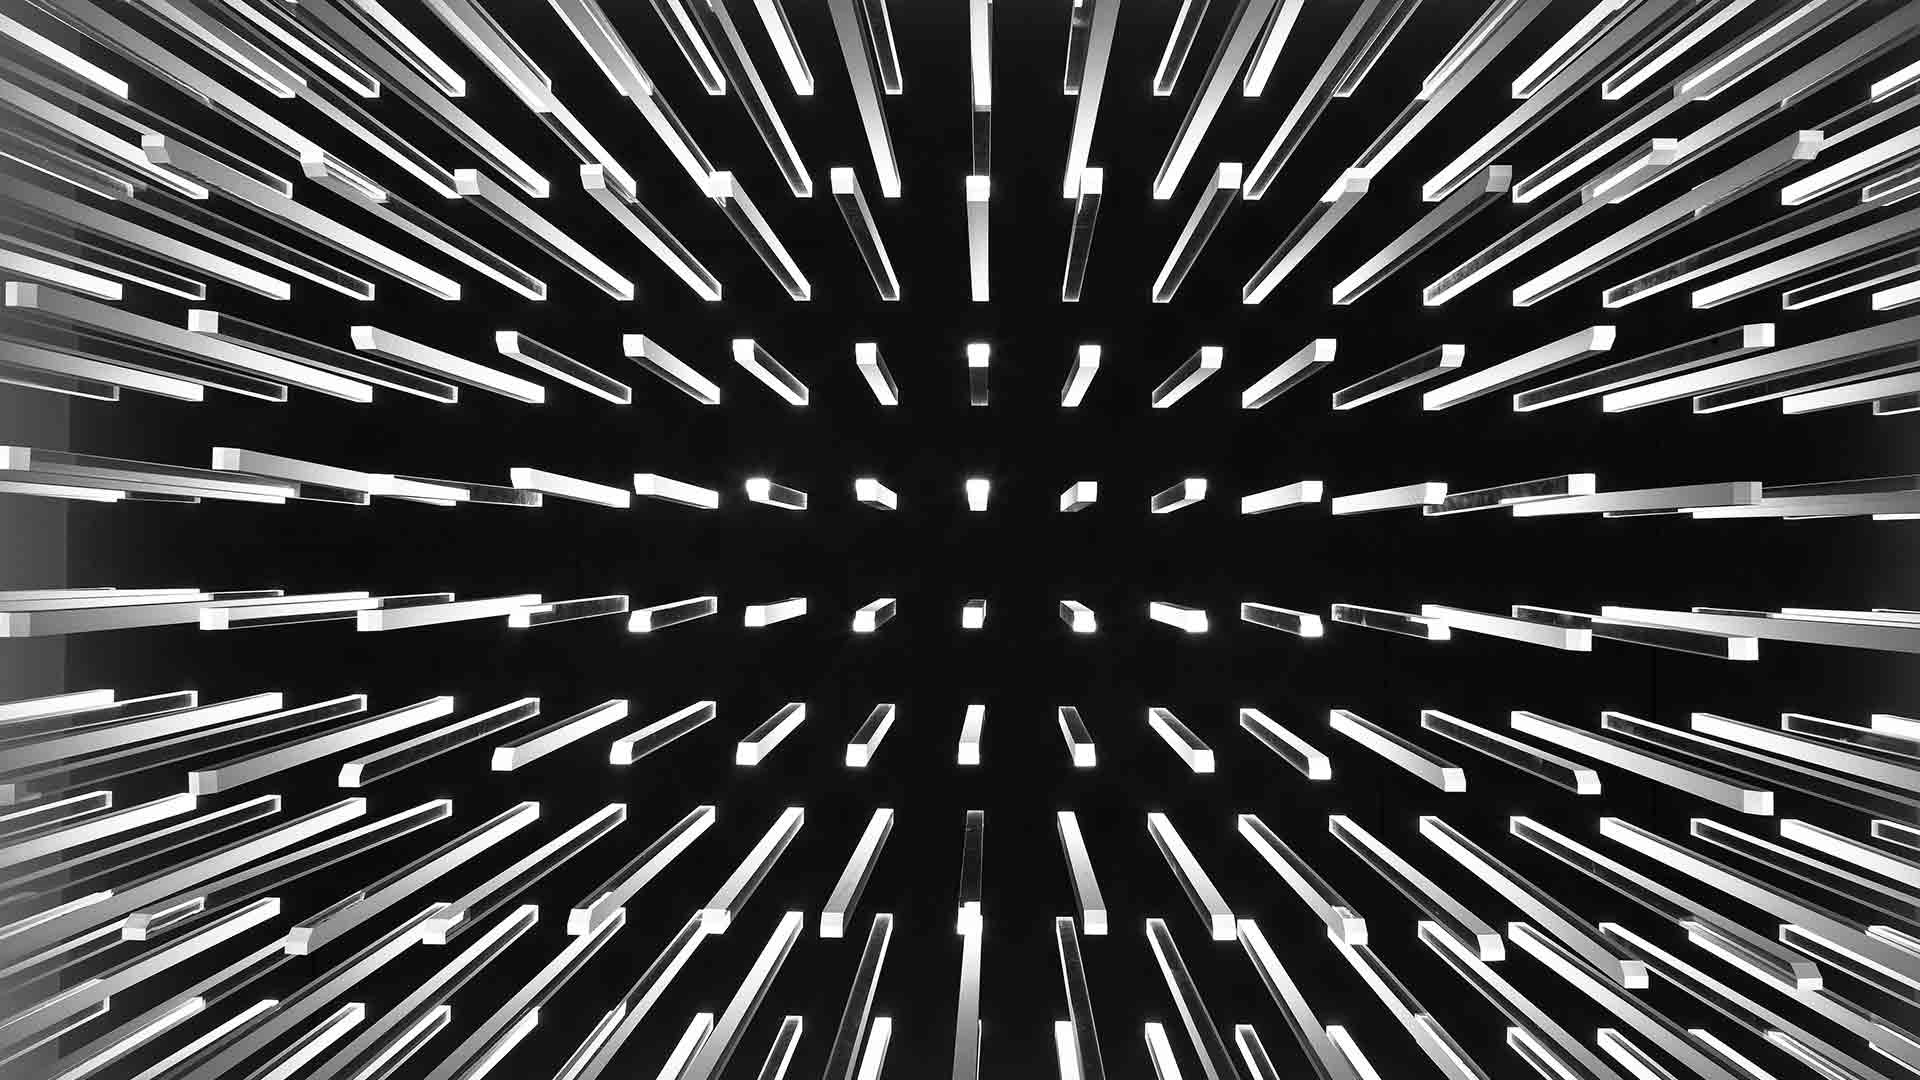 Light Sculpture Texture Chandelier Installation Vertical Lines Nulty